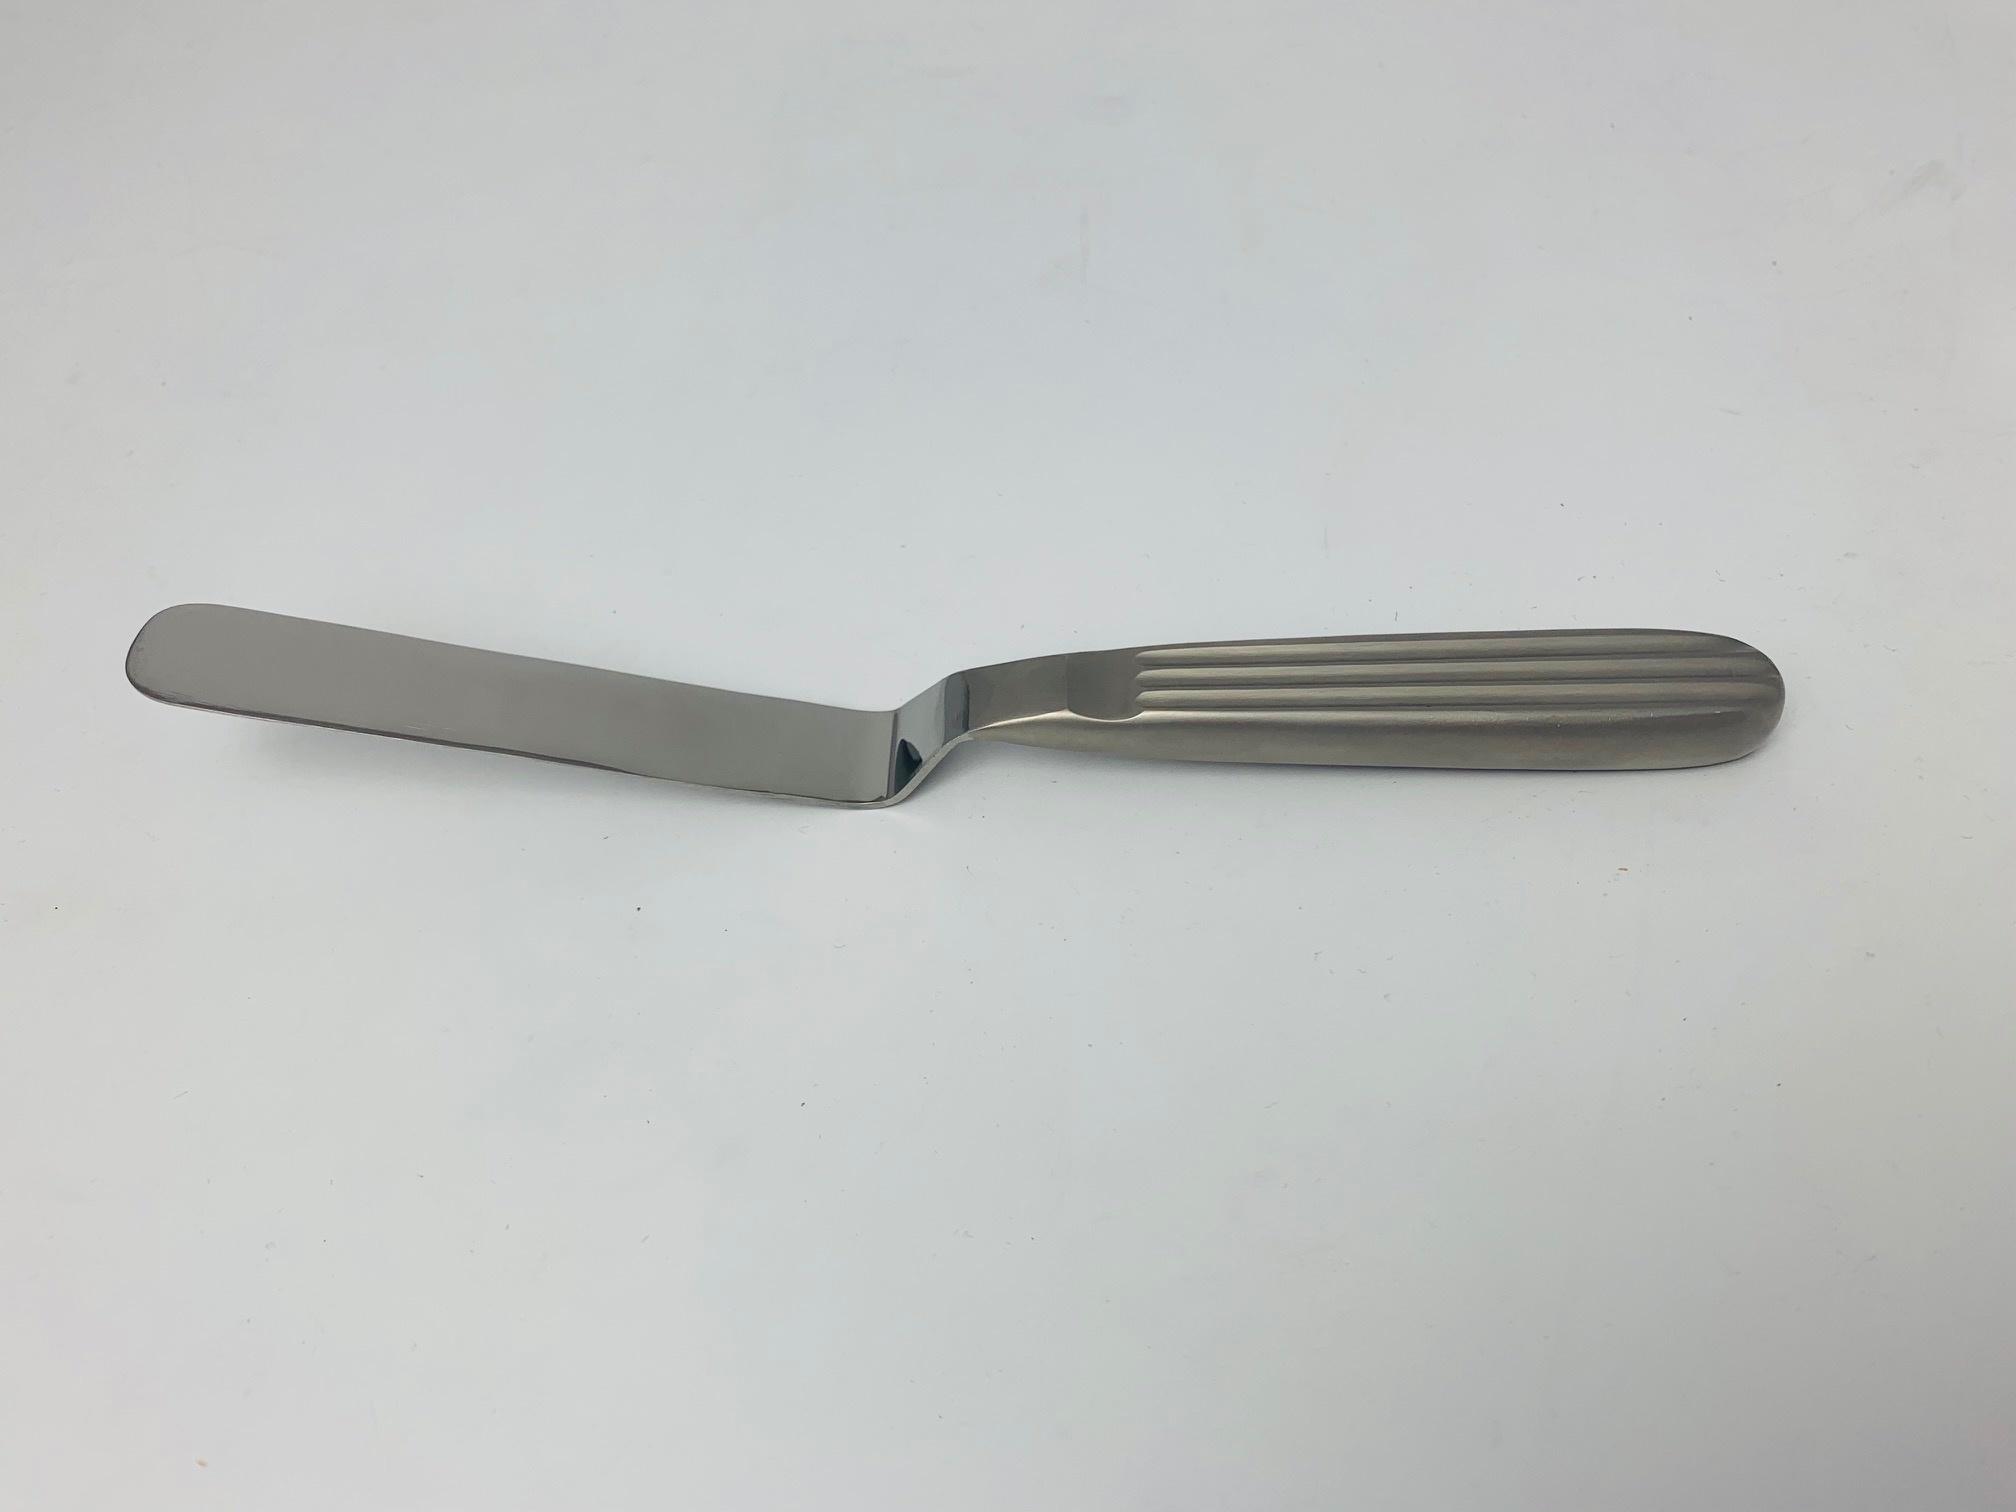 Knikpalet 19cm